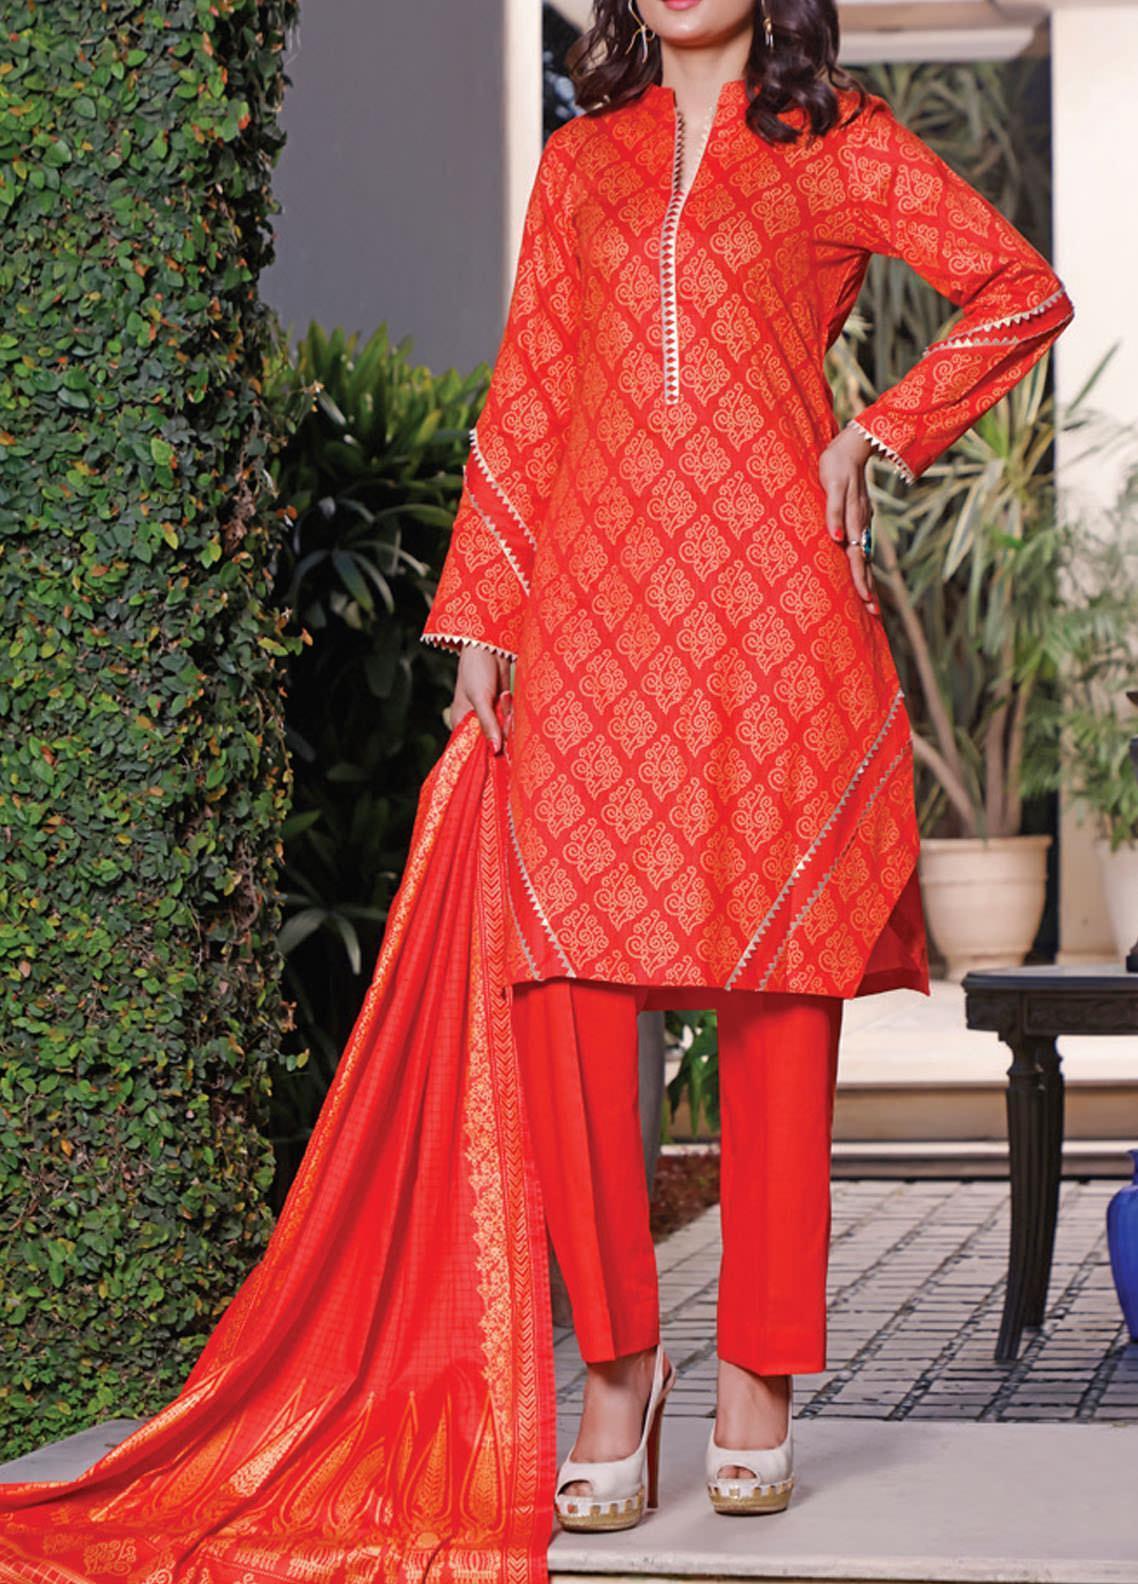 Daman by VS Textiles Printed Lawn Suits Unstitched 3 Piece VS21DL-3 1330C - Summer Collection